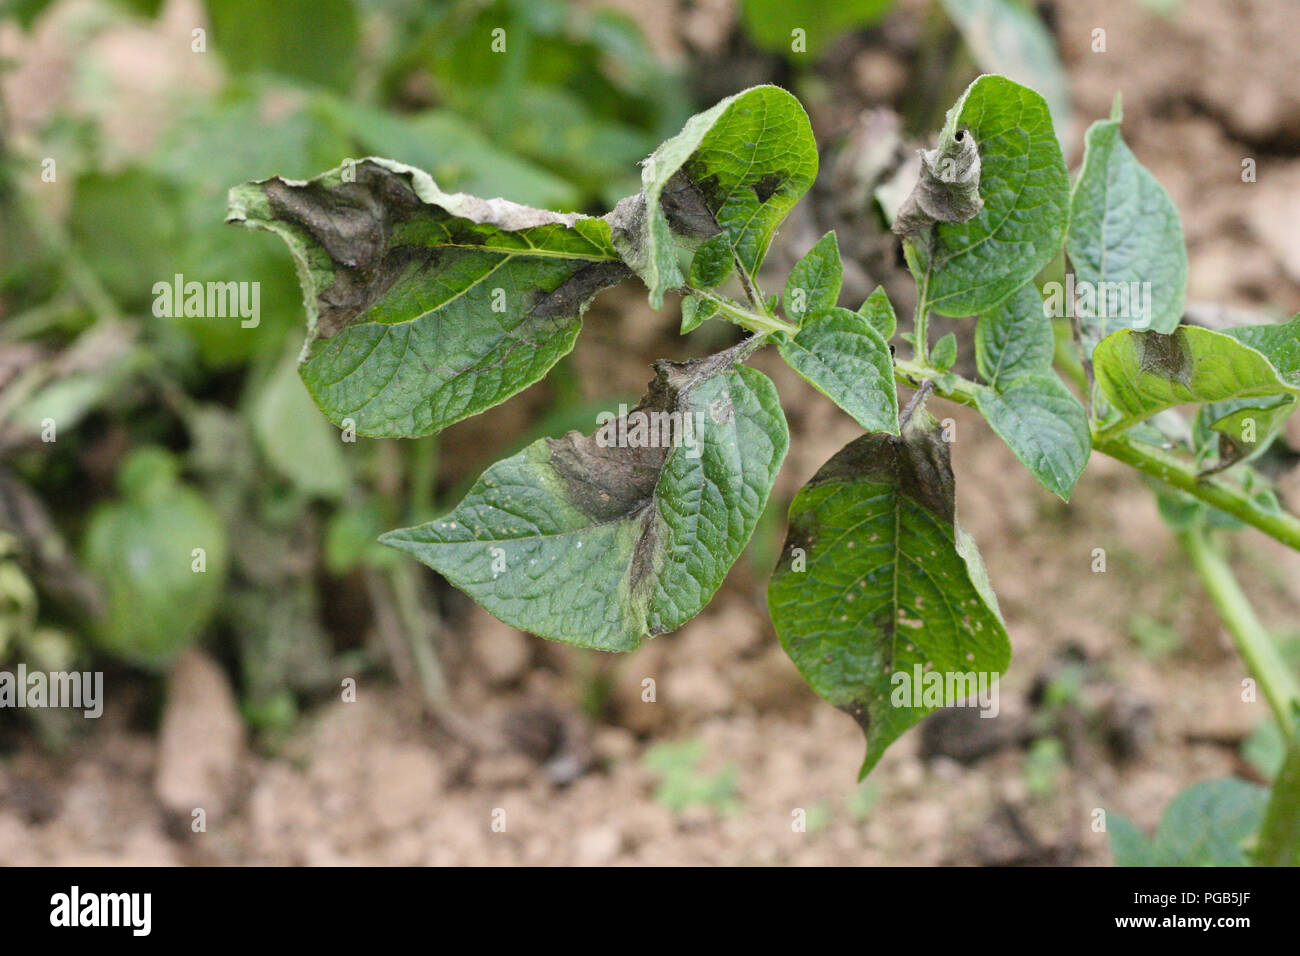 Potato late blight symptom on leaves - Stock Image